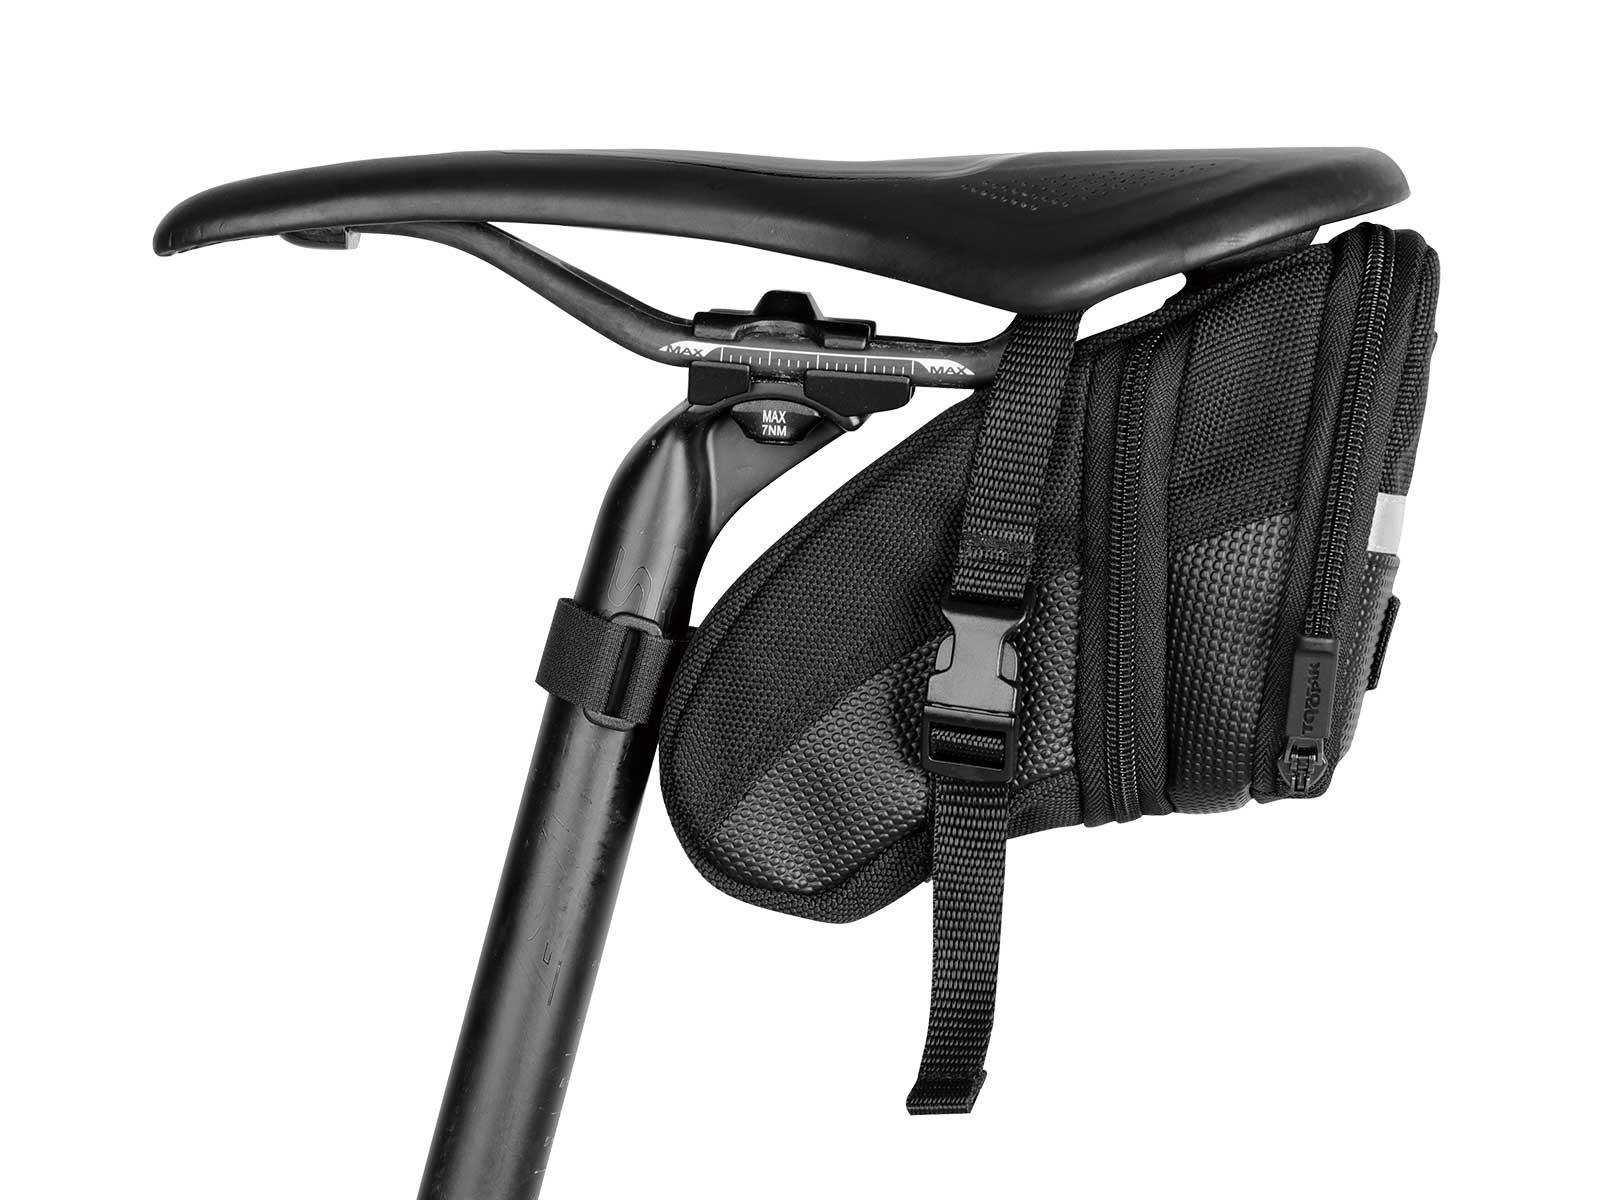 Bolsa de selim Topeak Aero Wedge Pack - Média